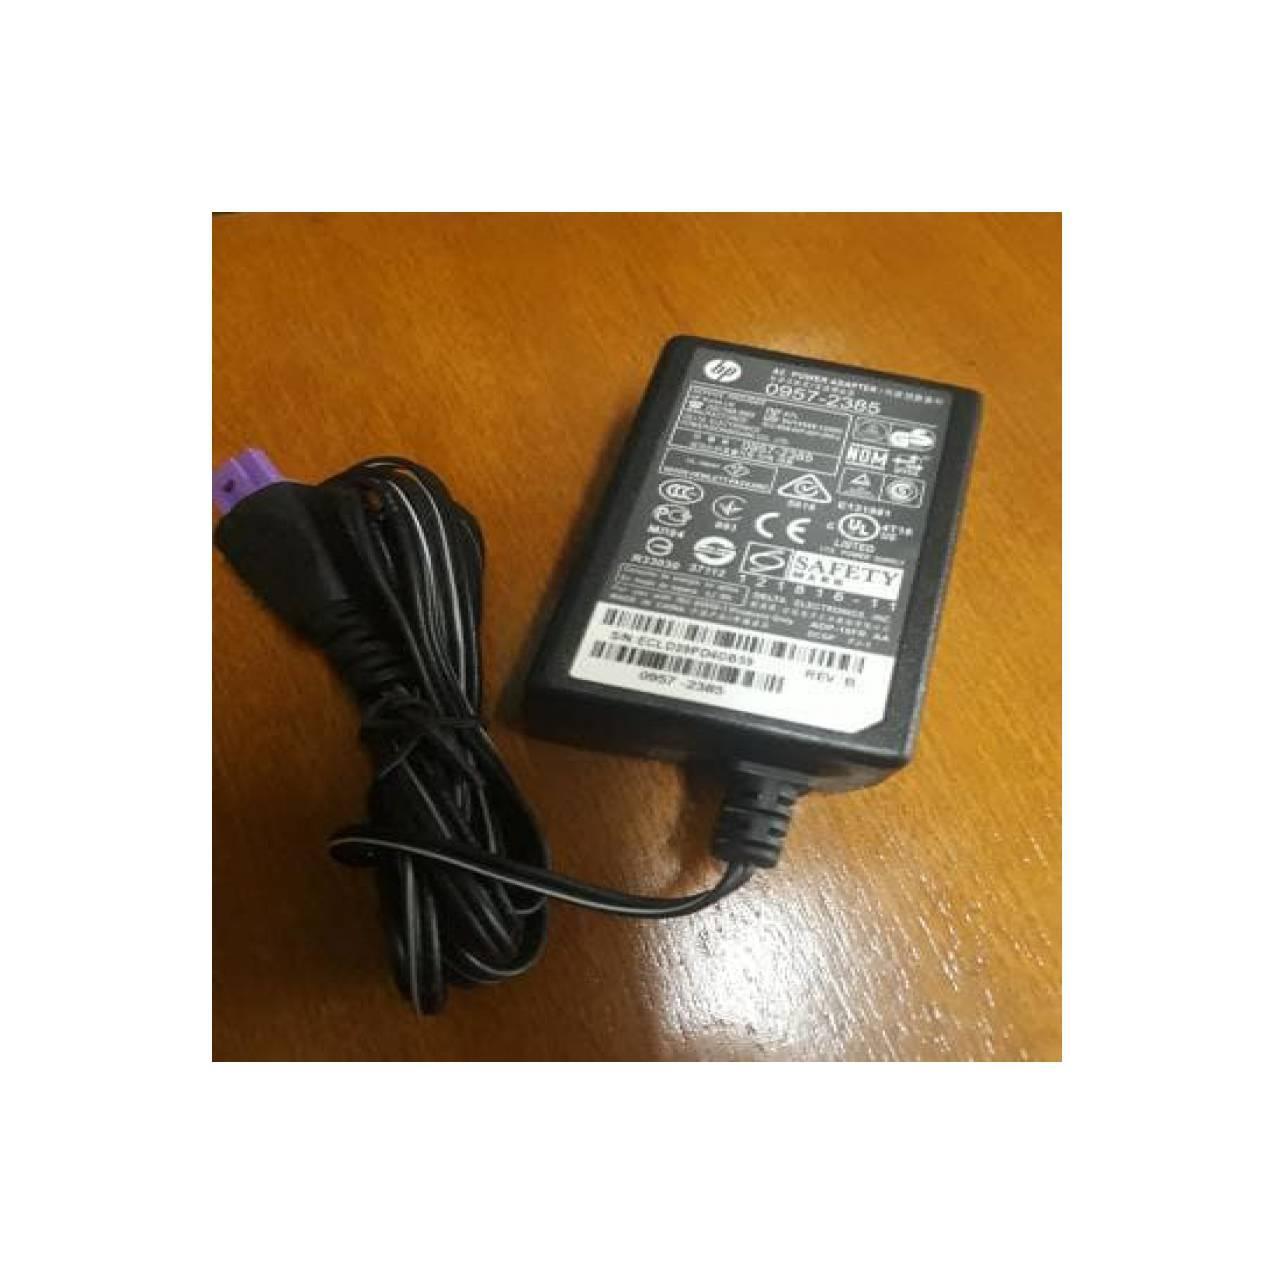 Promo Adaptor/Charger Printer Hp 1515 Original 22V-455Ma Diskon